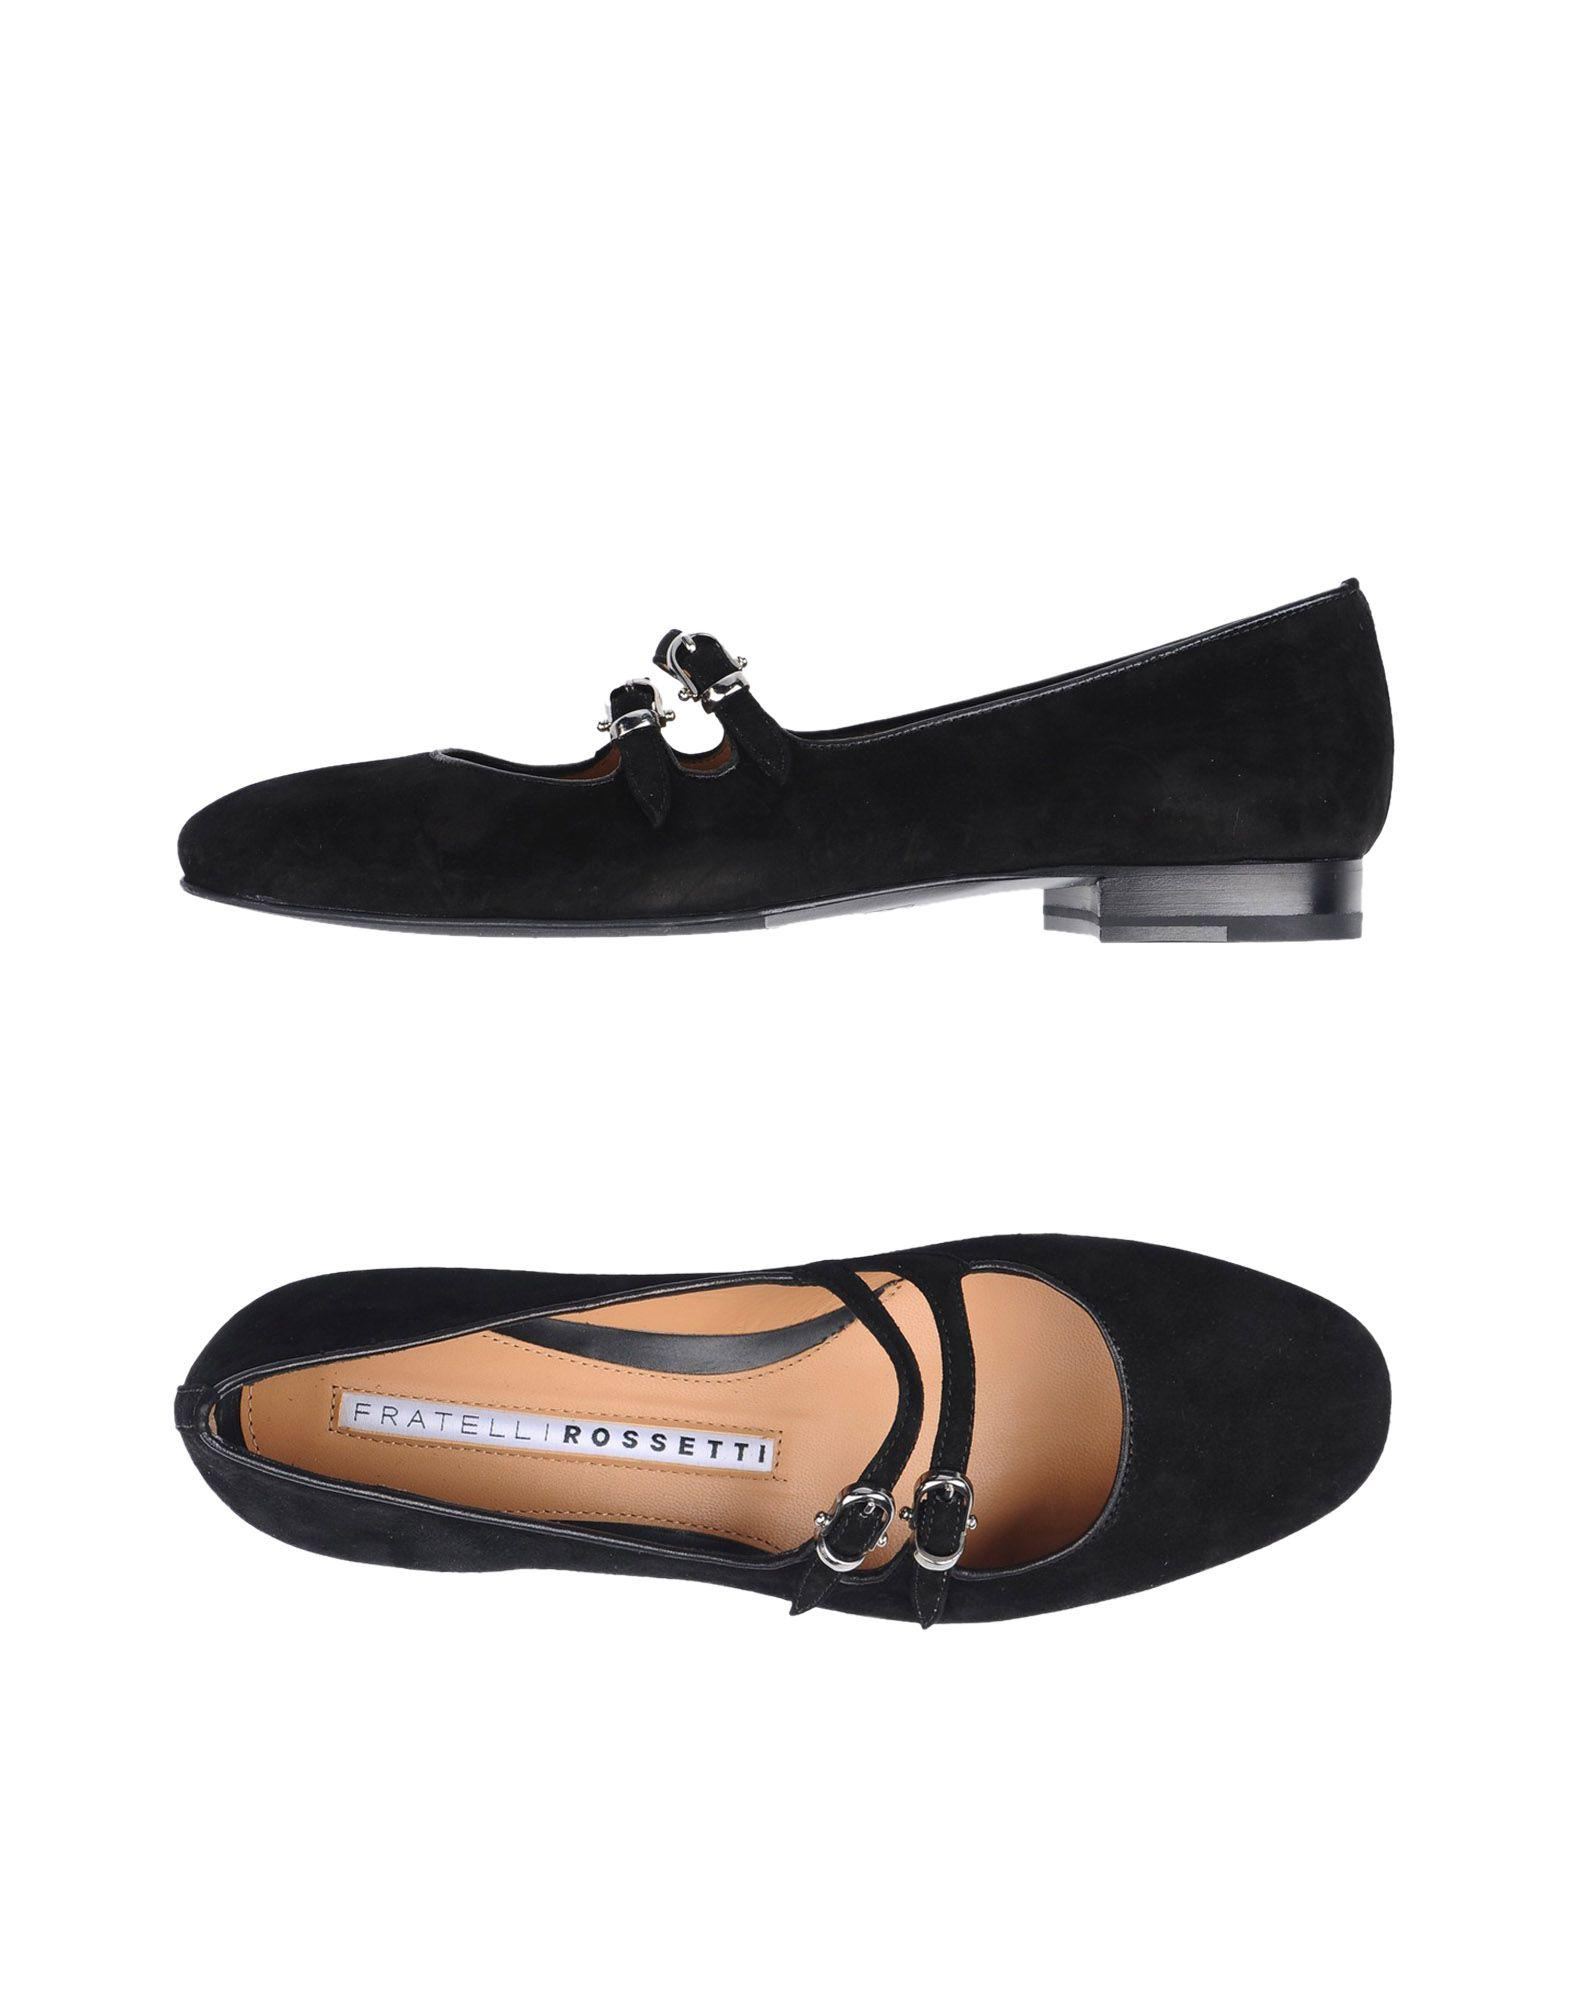 Fratelli Rossetti Leather Flats n0iPS